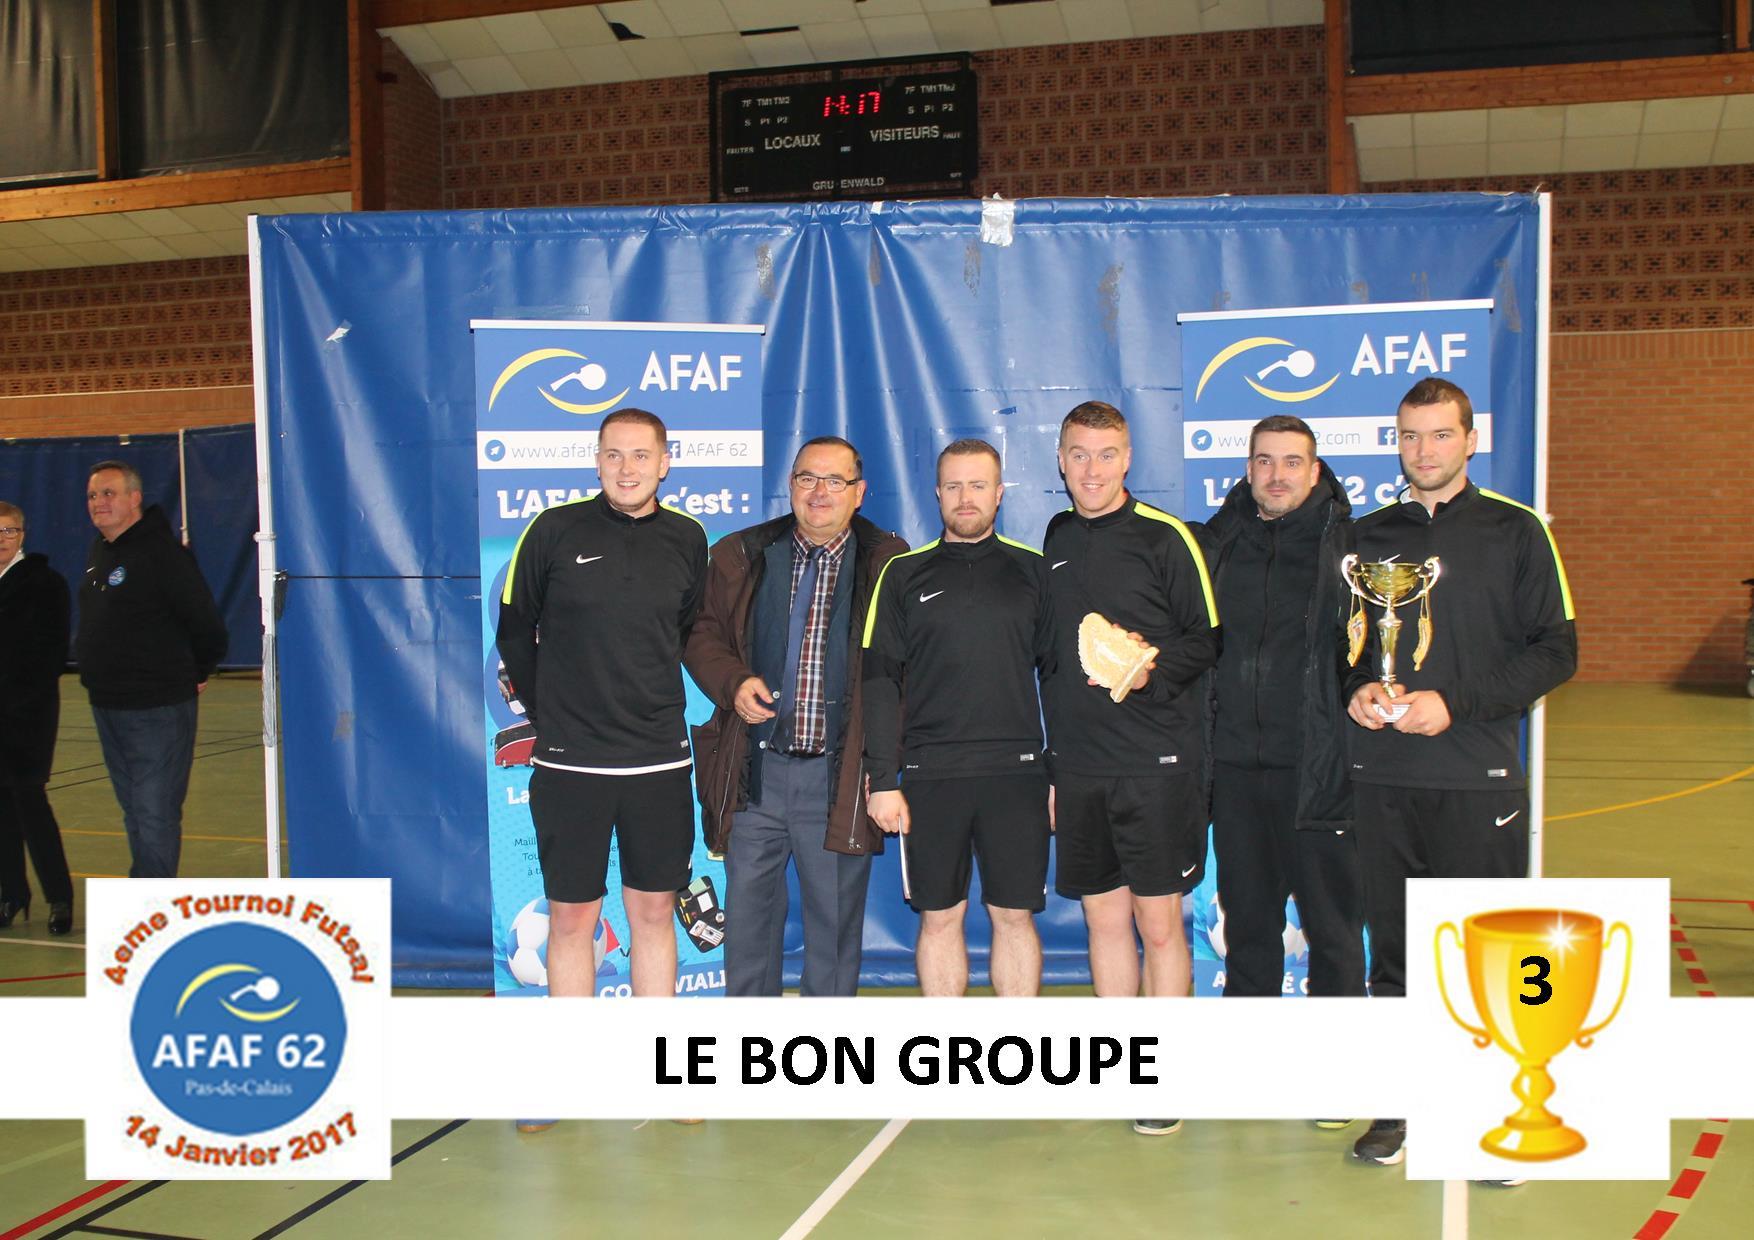 LE BON GROUPE.jpg